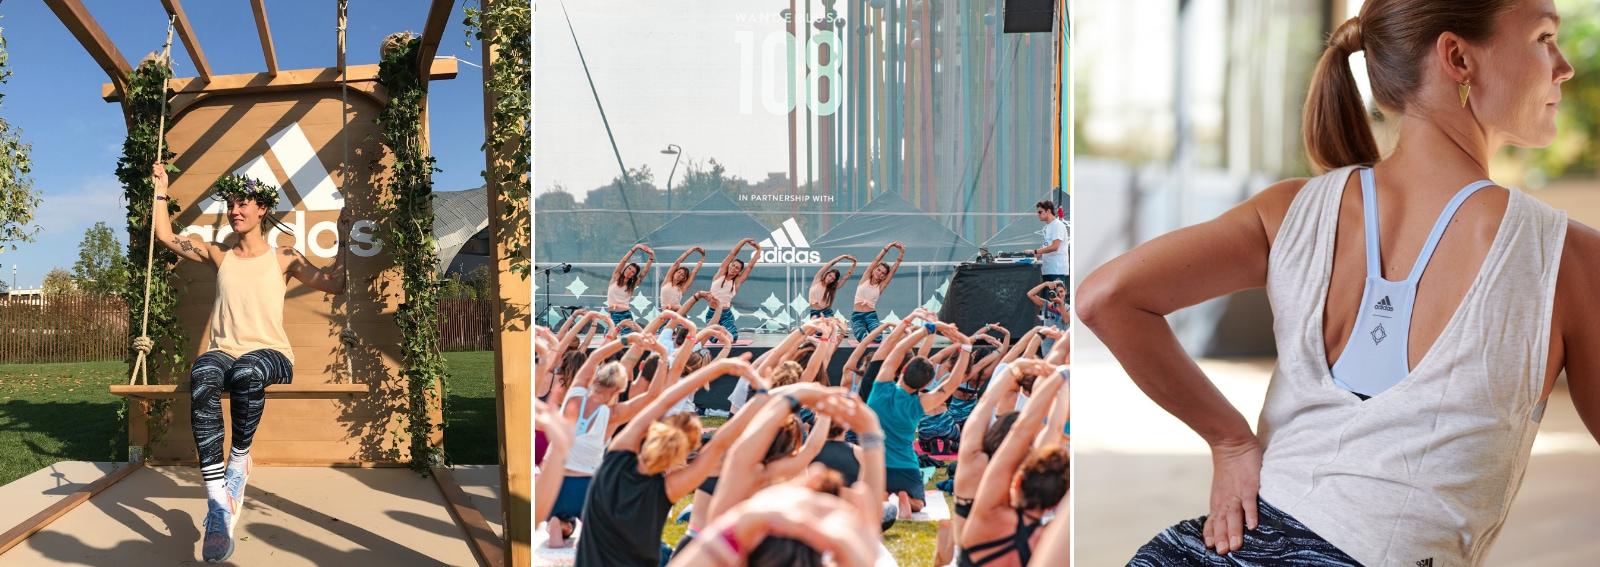 wanderlust 108 milano adidas yoga corsa meditazione Desk